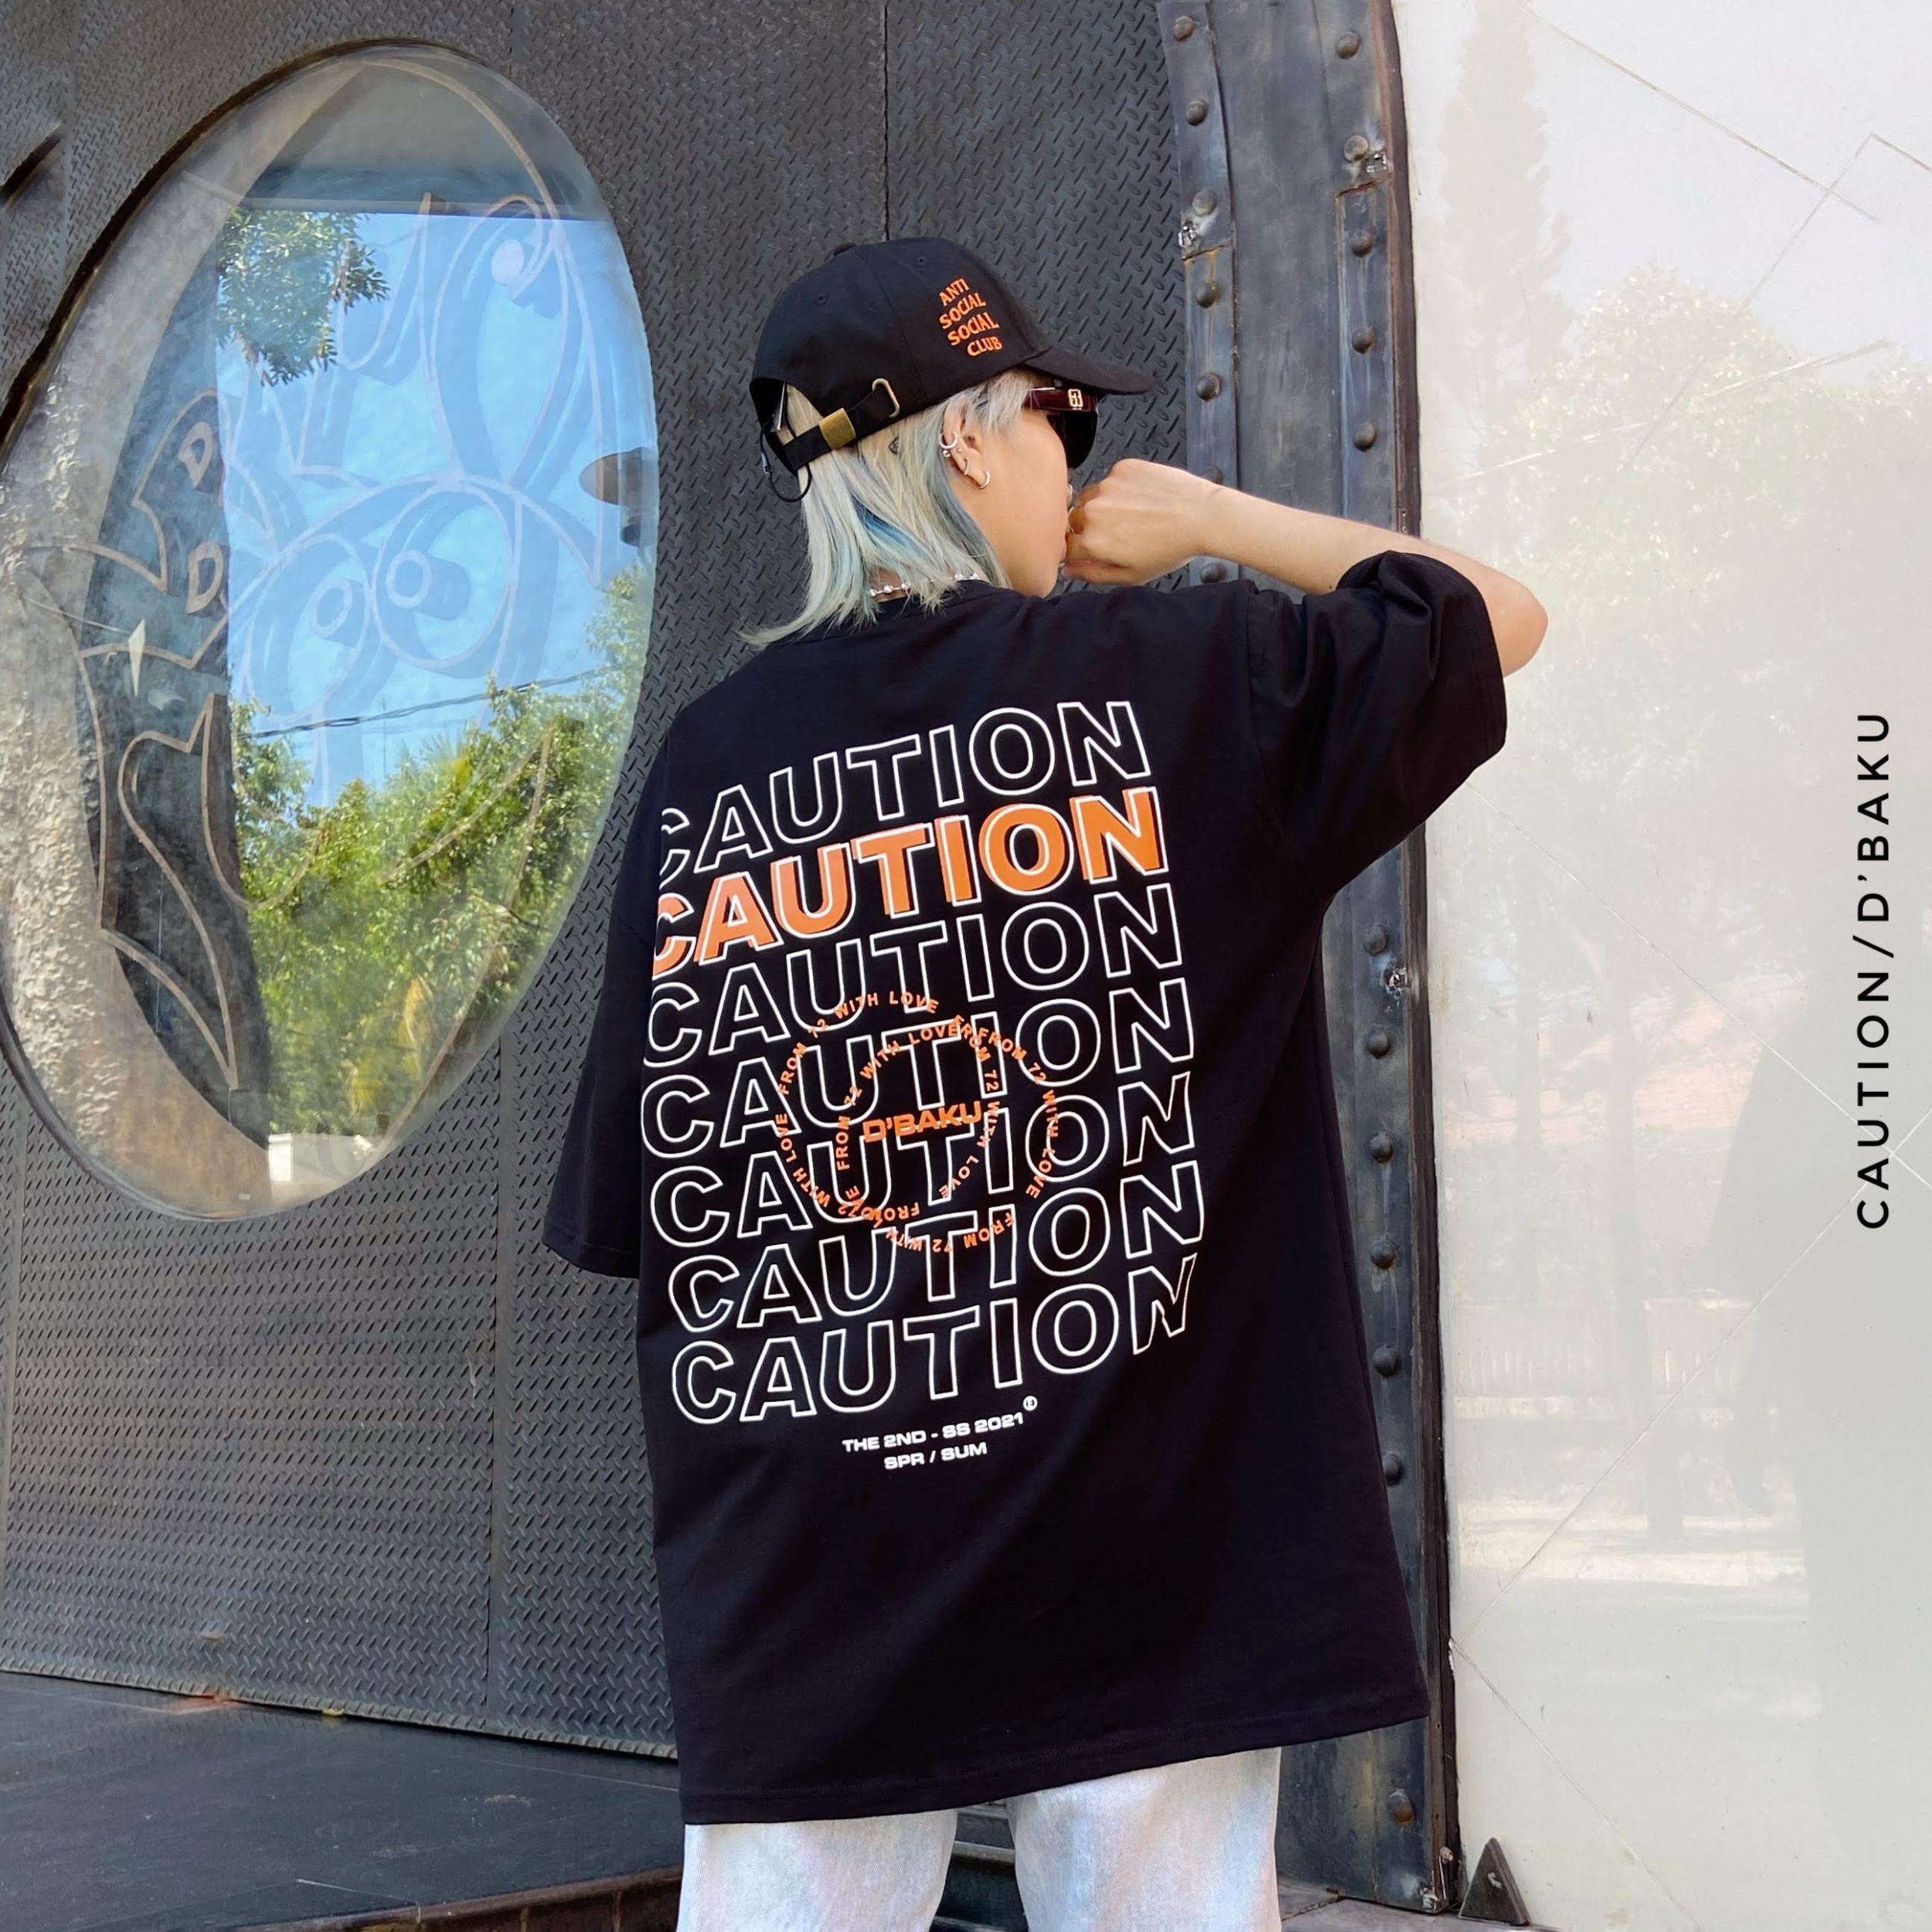 [TE] CAUTION